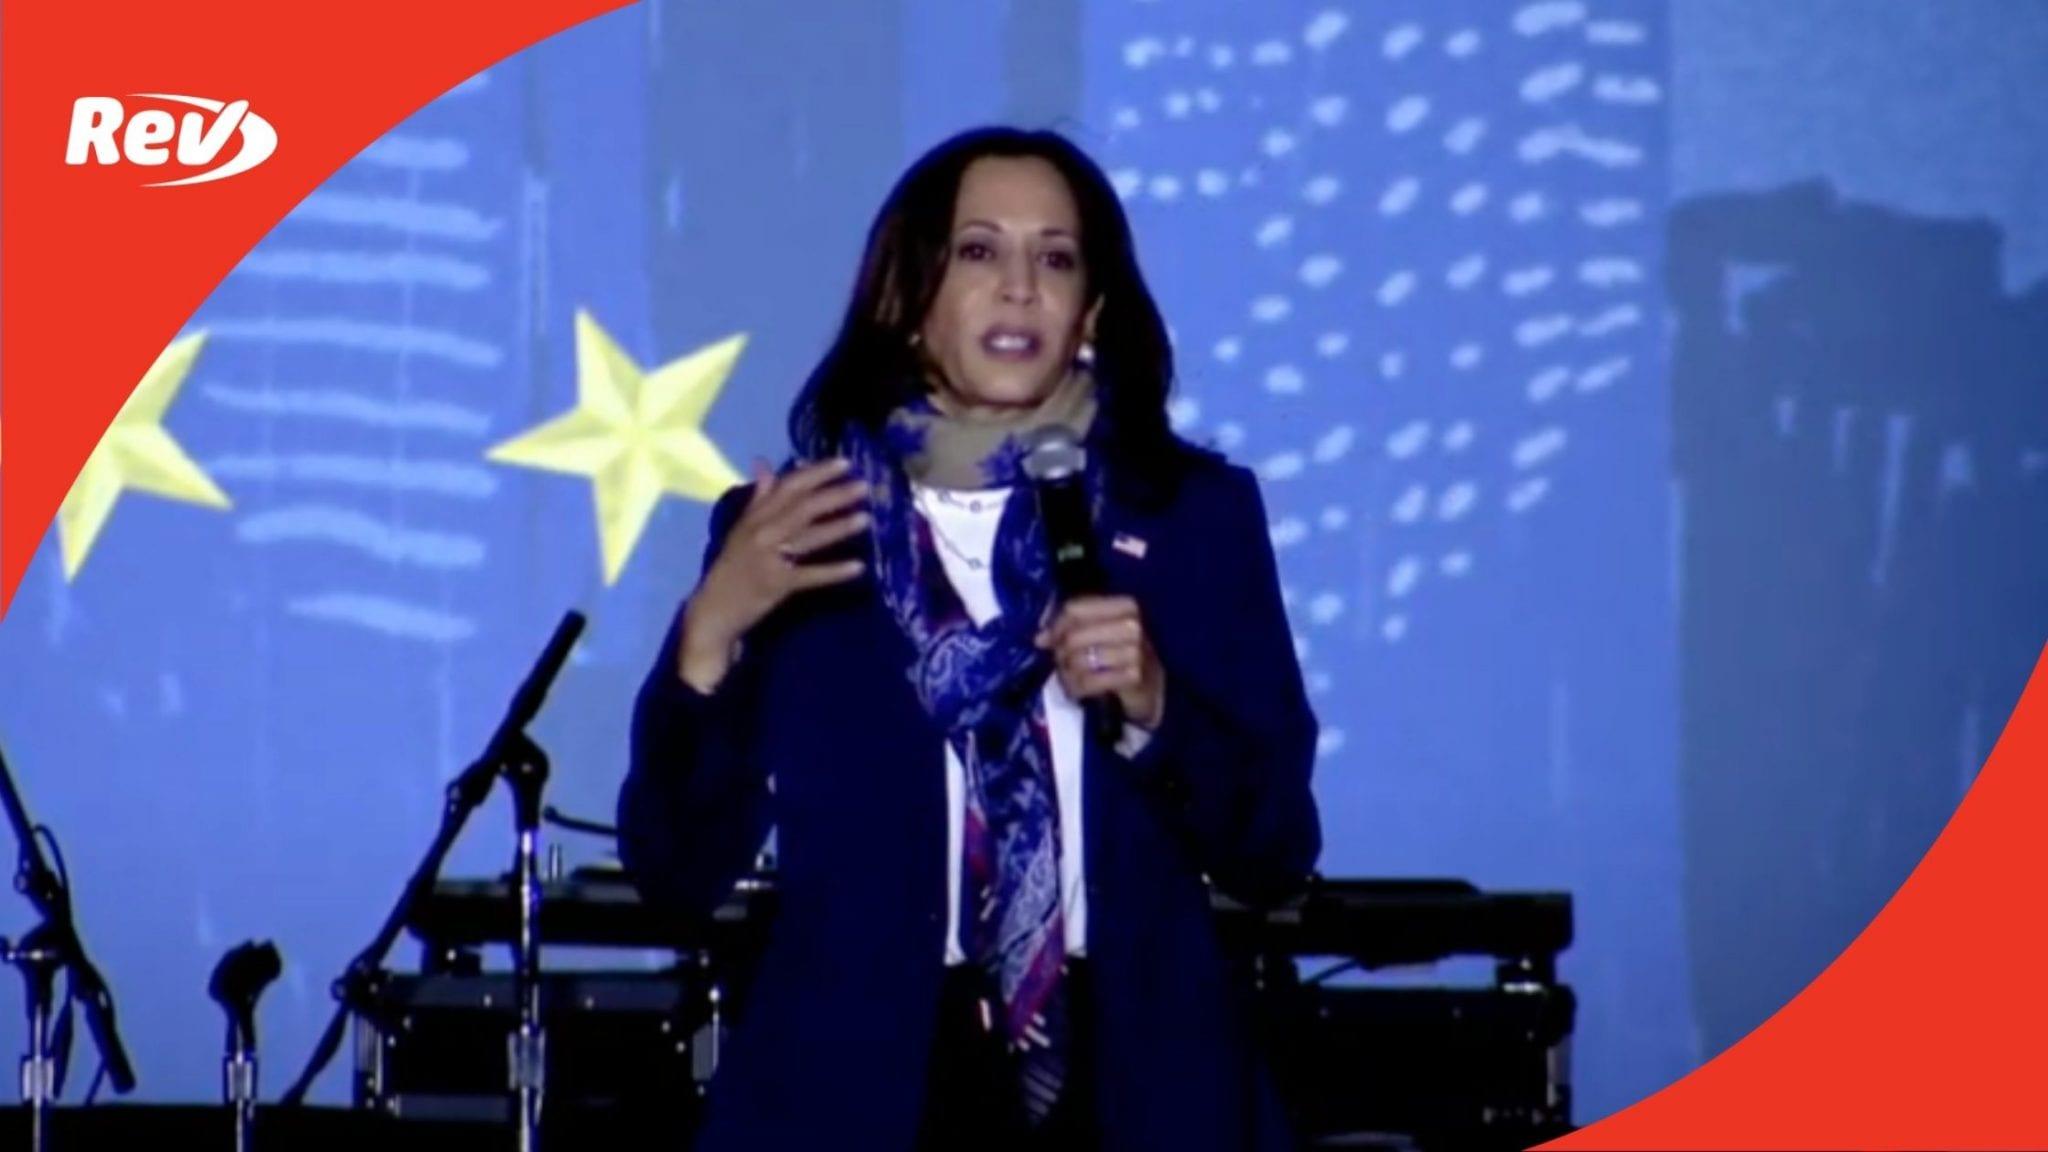 Kamala Harris Campaign Event Speech Transcript Houston, TX October 30